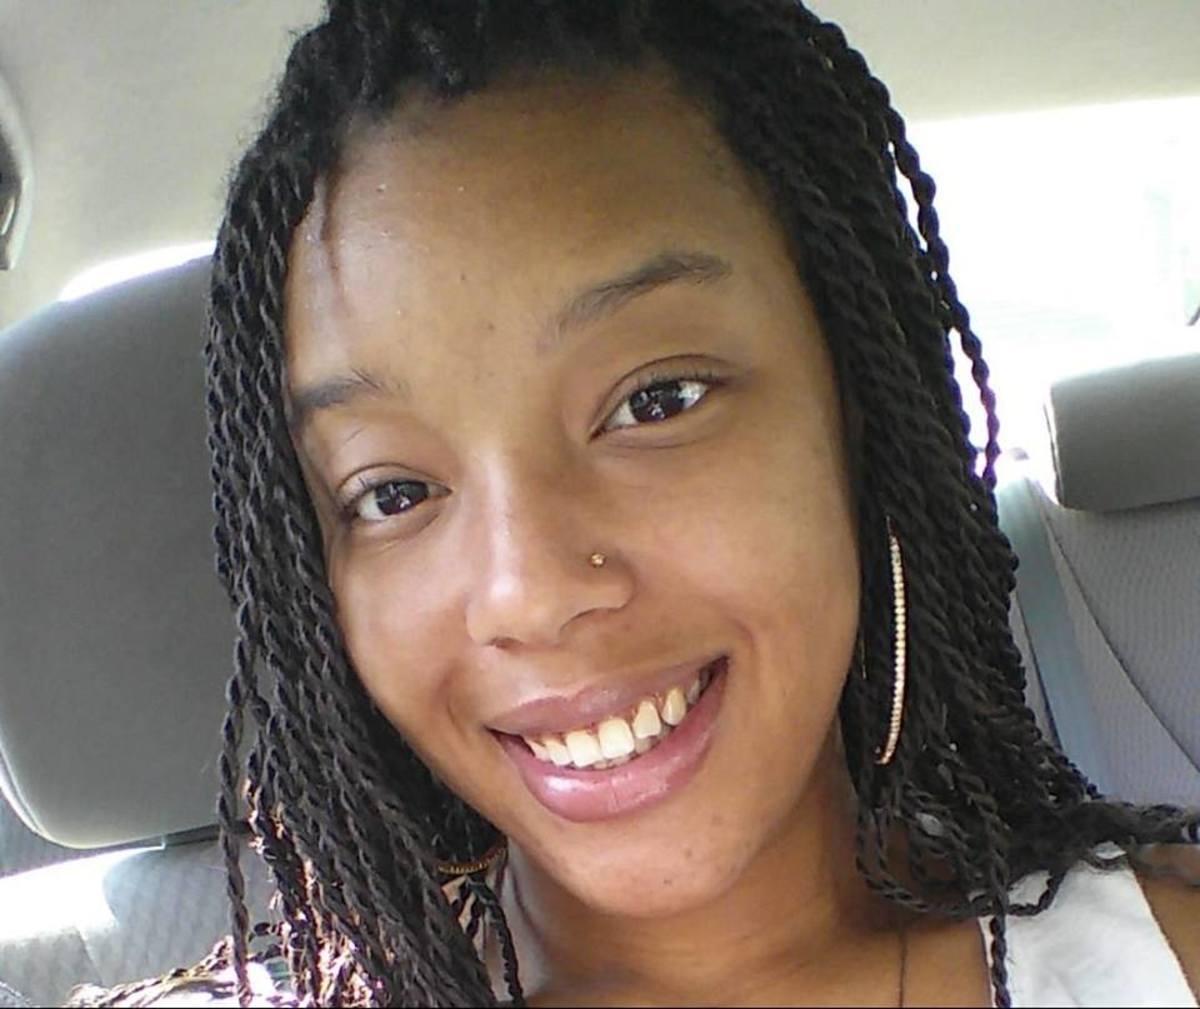 Photo of Tyarra Williams.